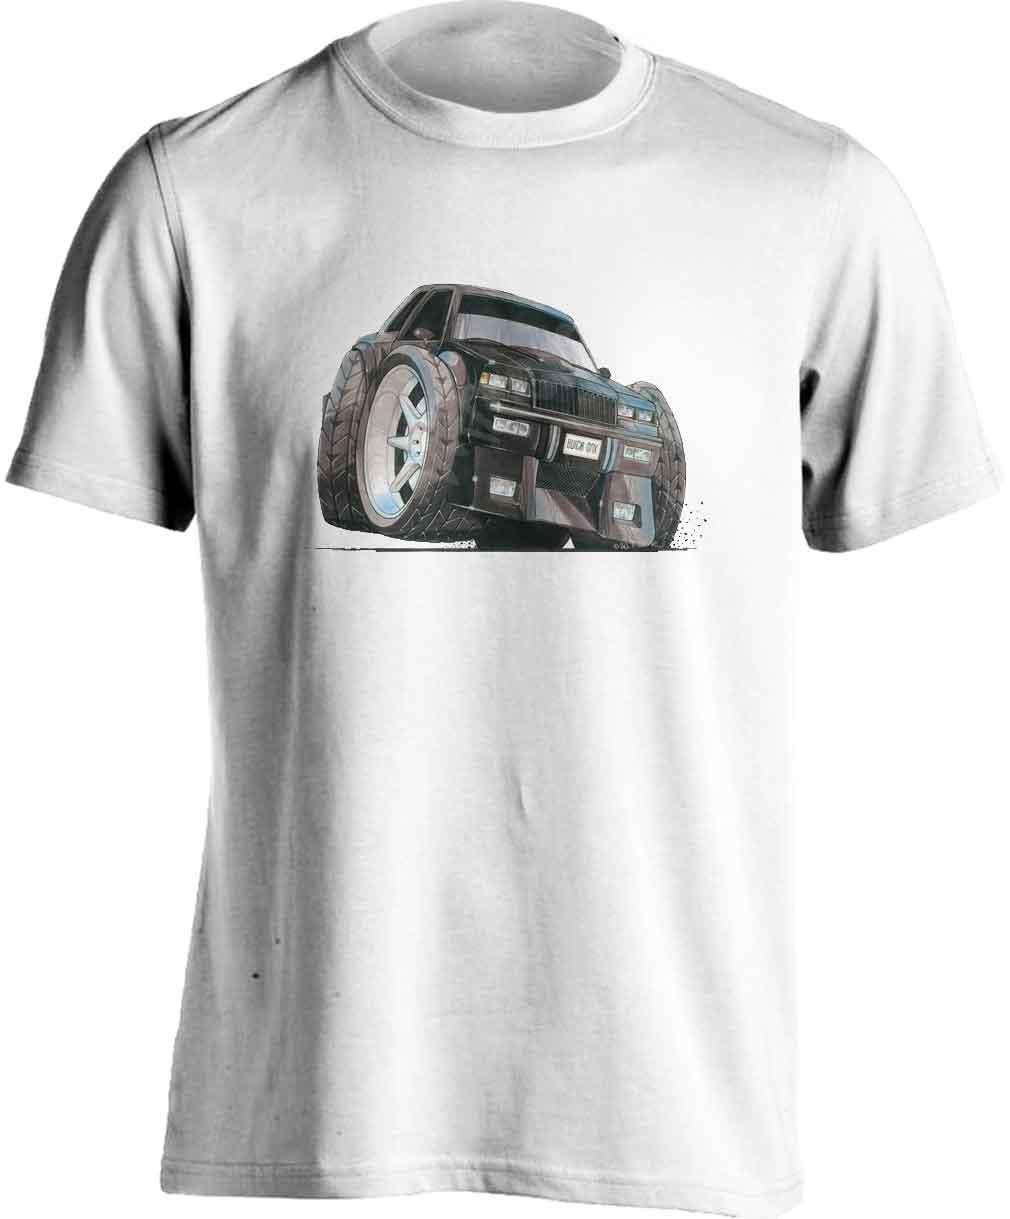 Koolart Buick Gnx Black–1121 Child's T Shirt